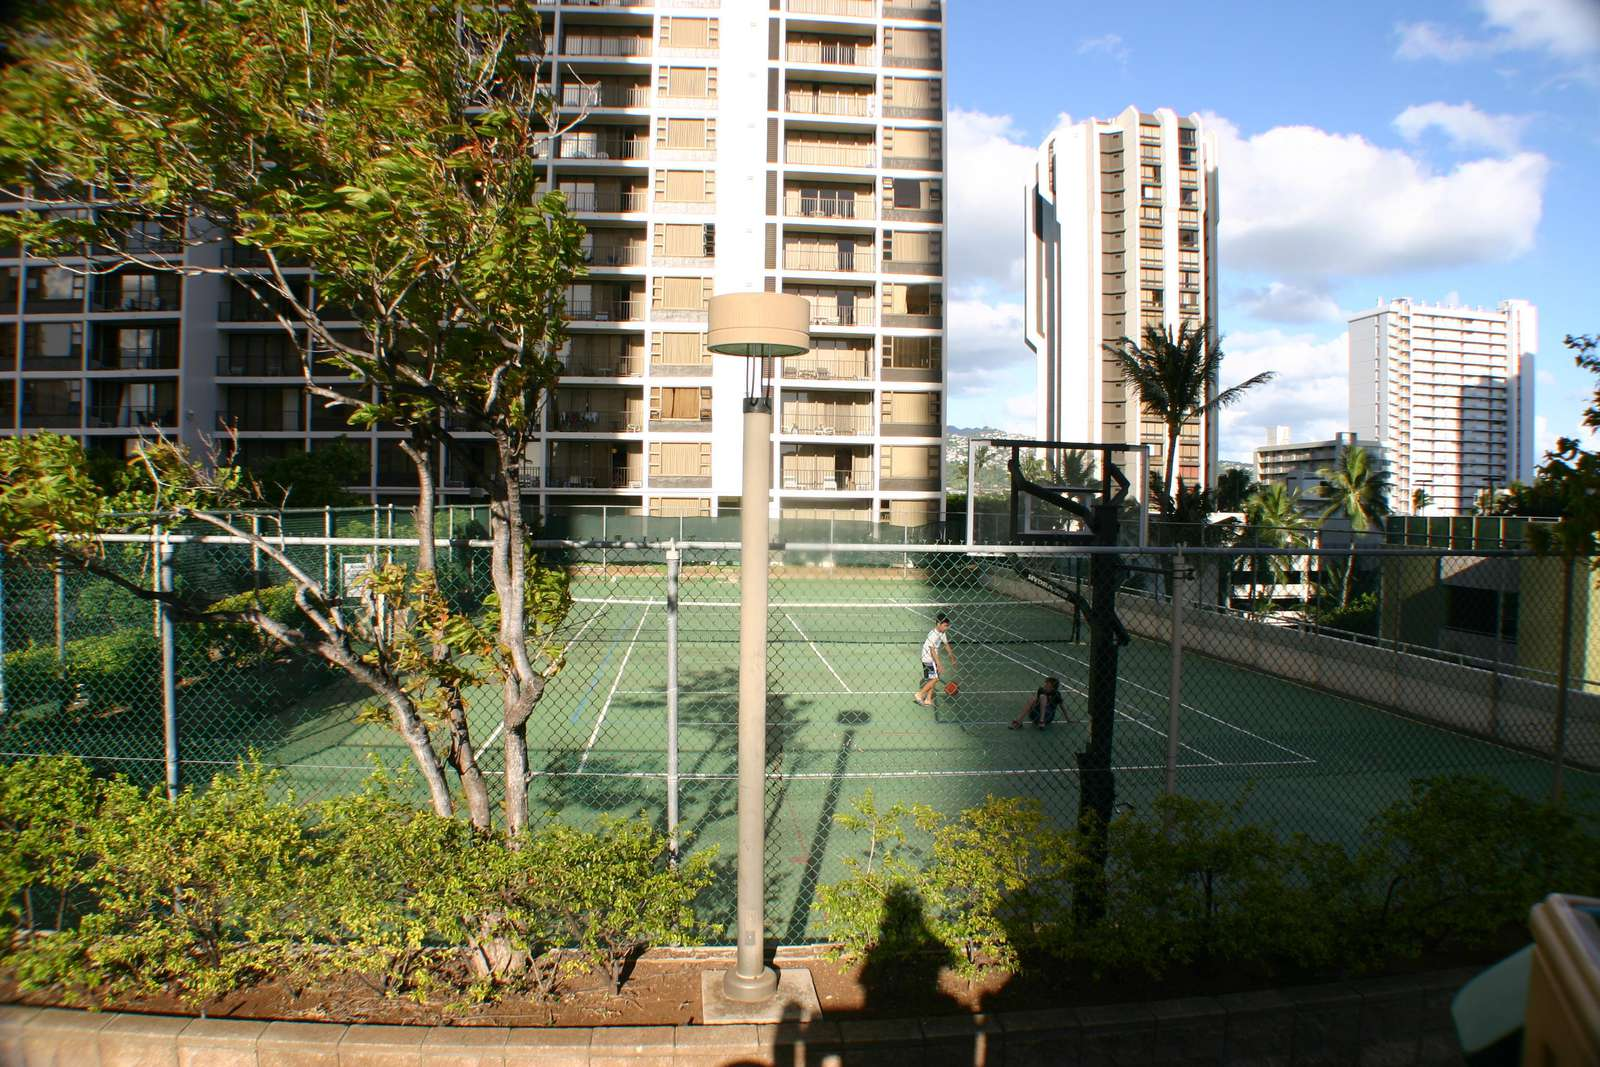 tennis court on the recreation deck